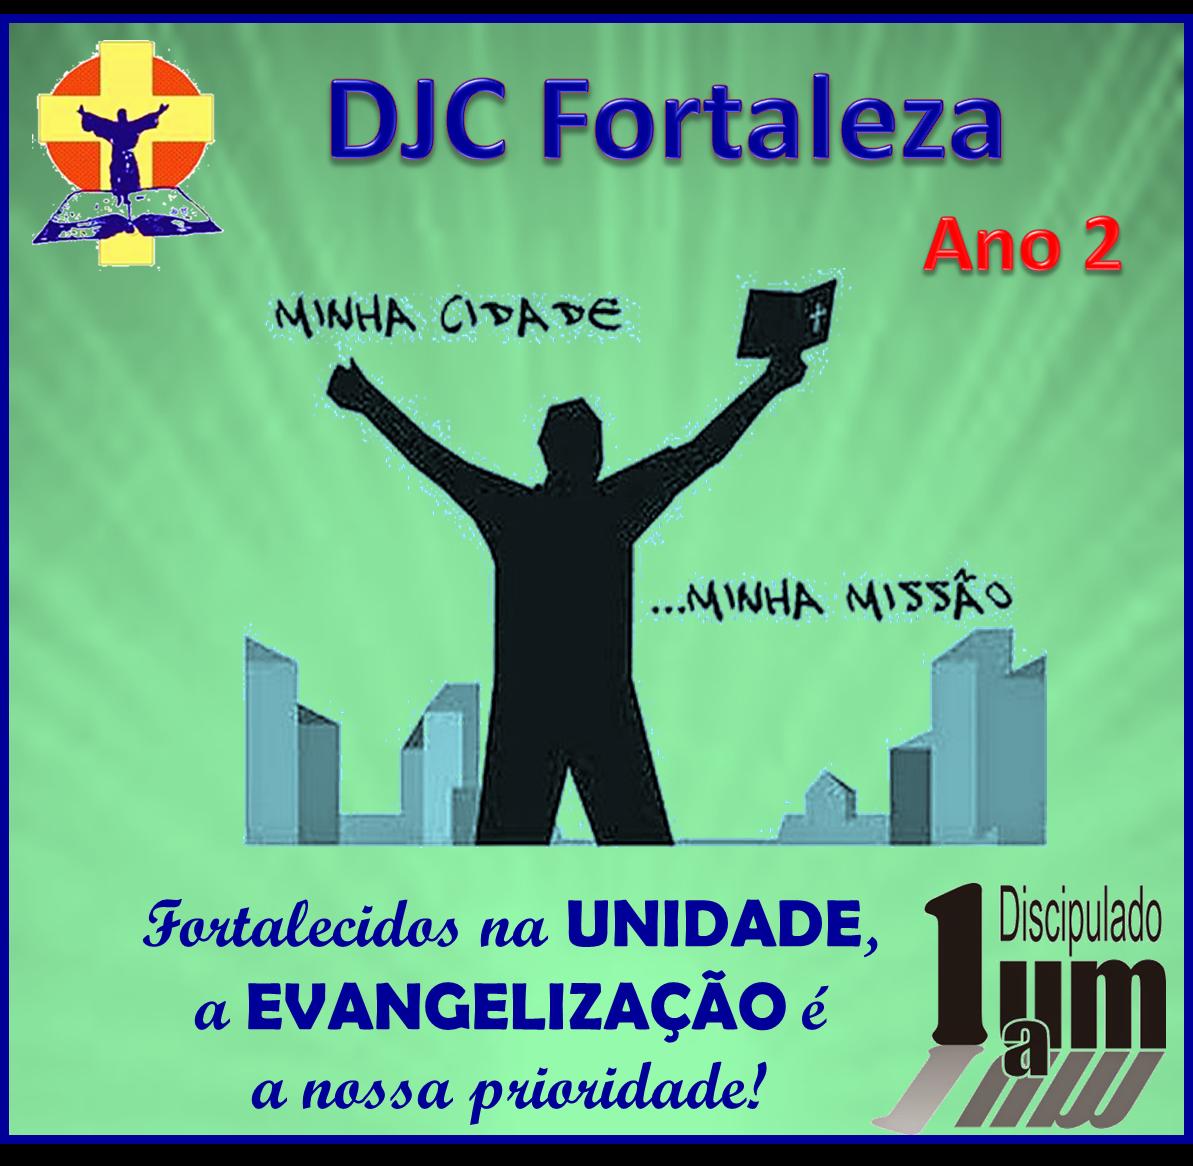 djc fortaleza